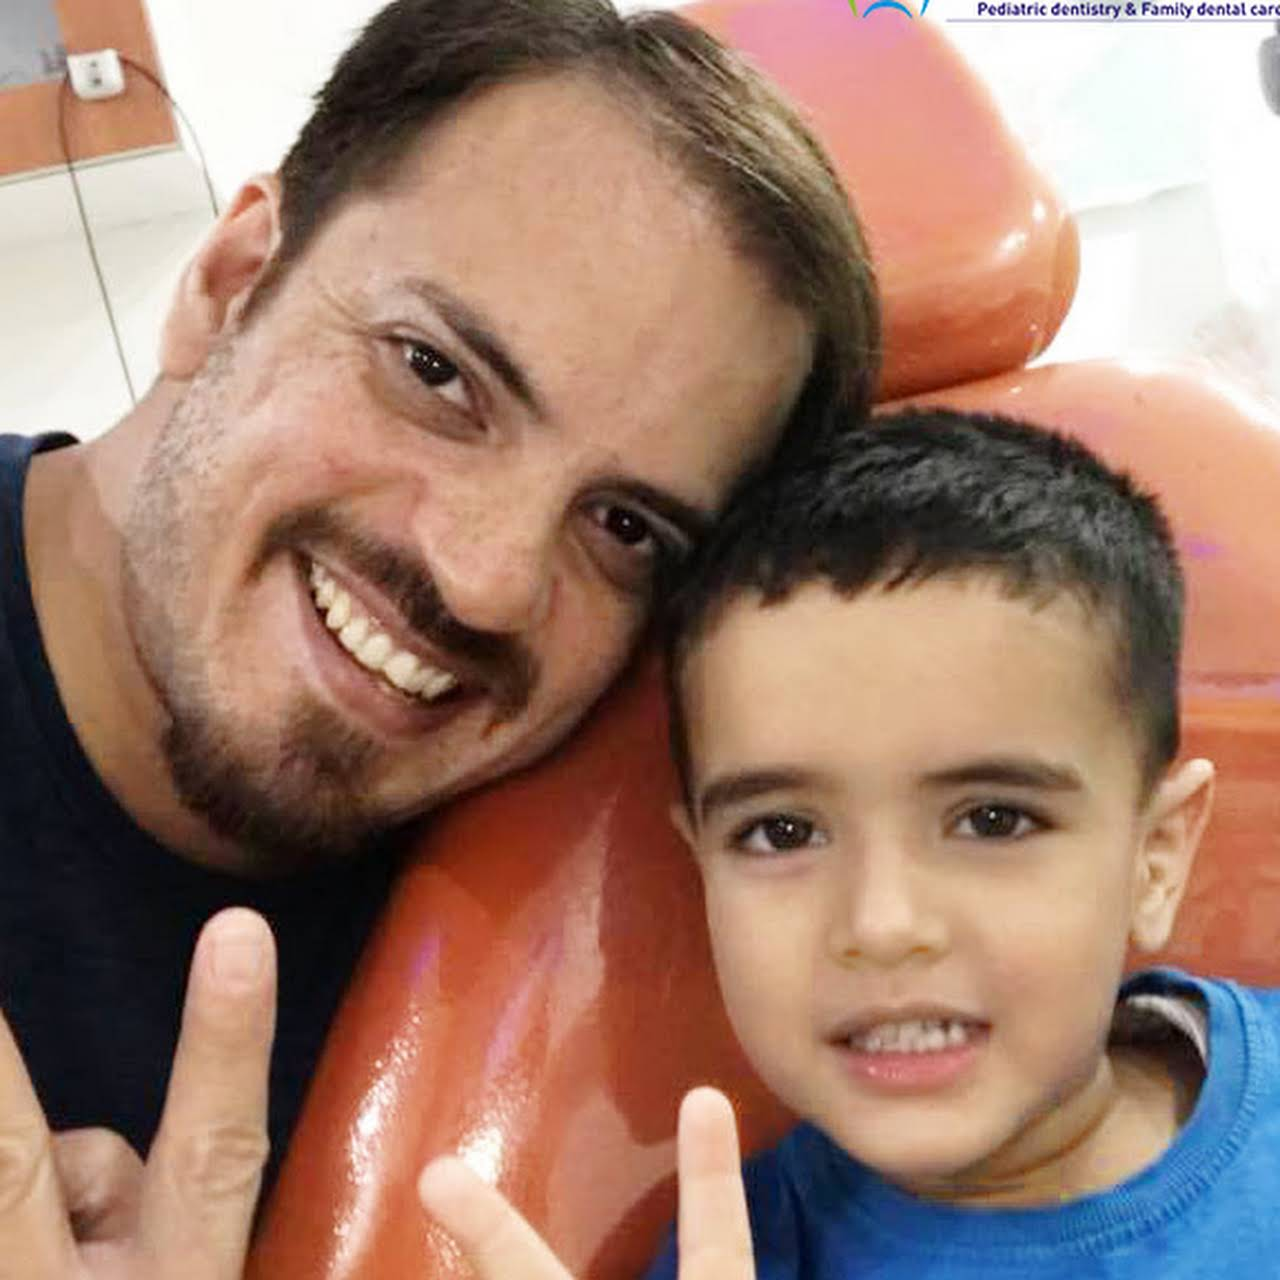 Abc Dental Care kinder smiles pediatric dentistry and family dental care